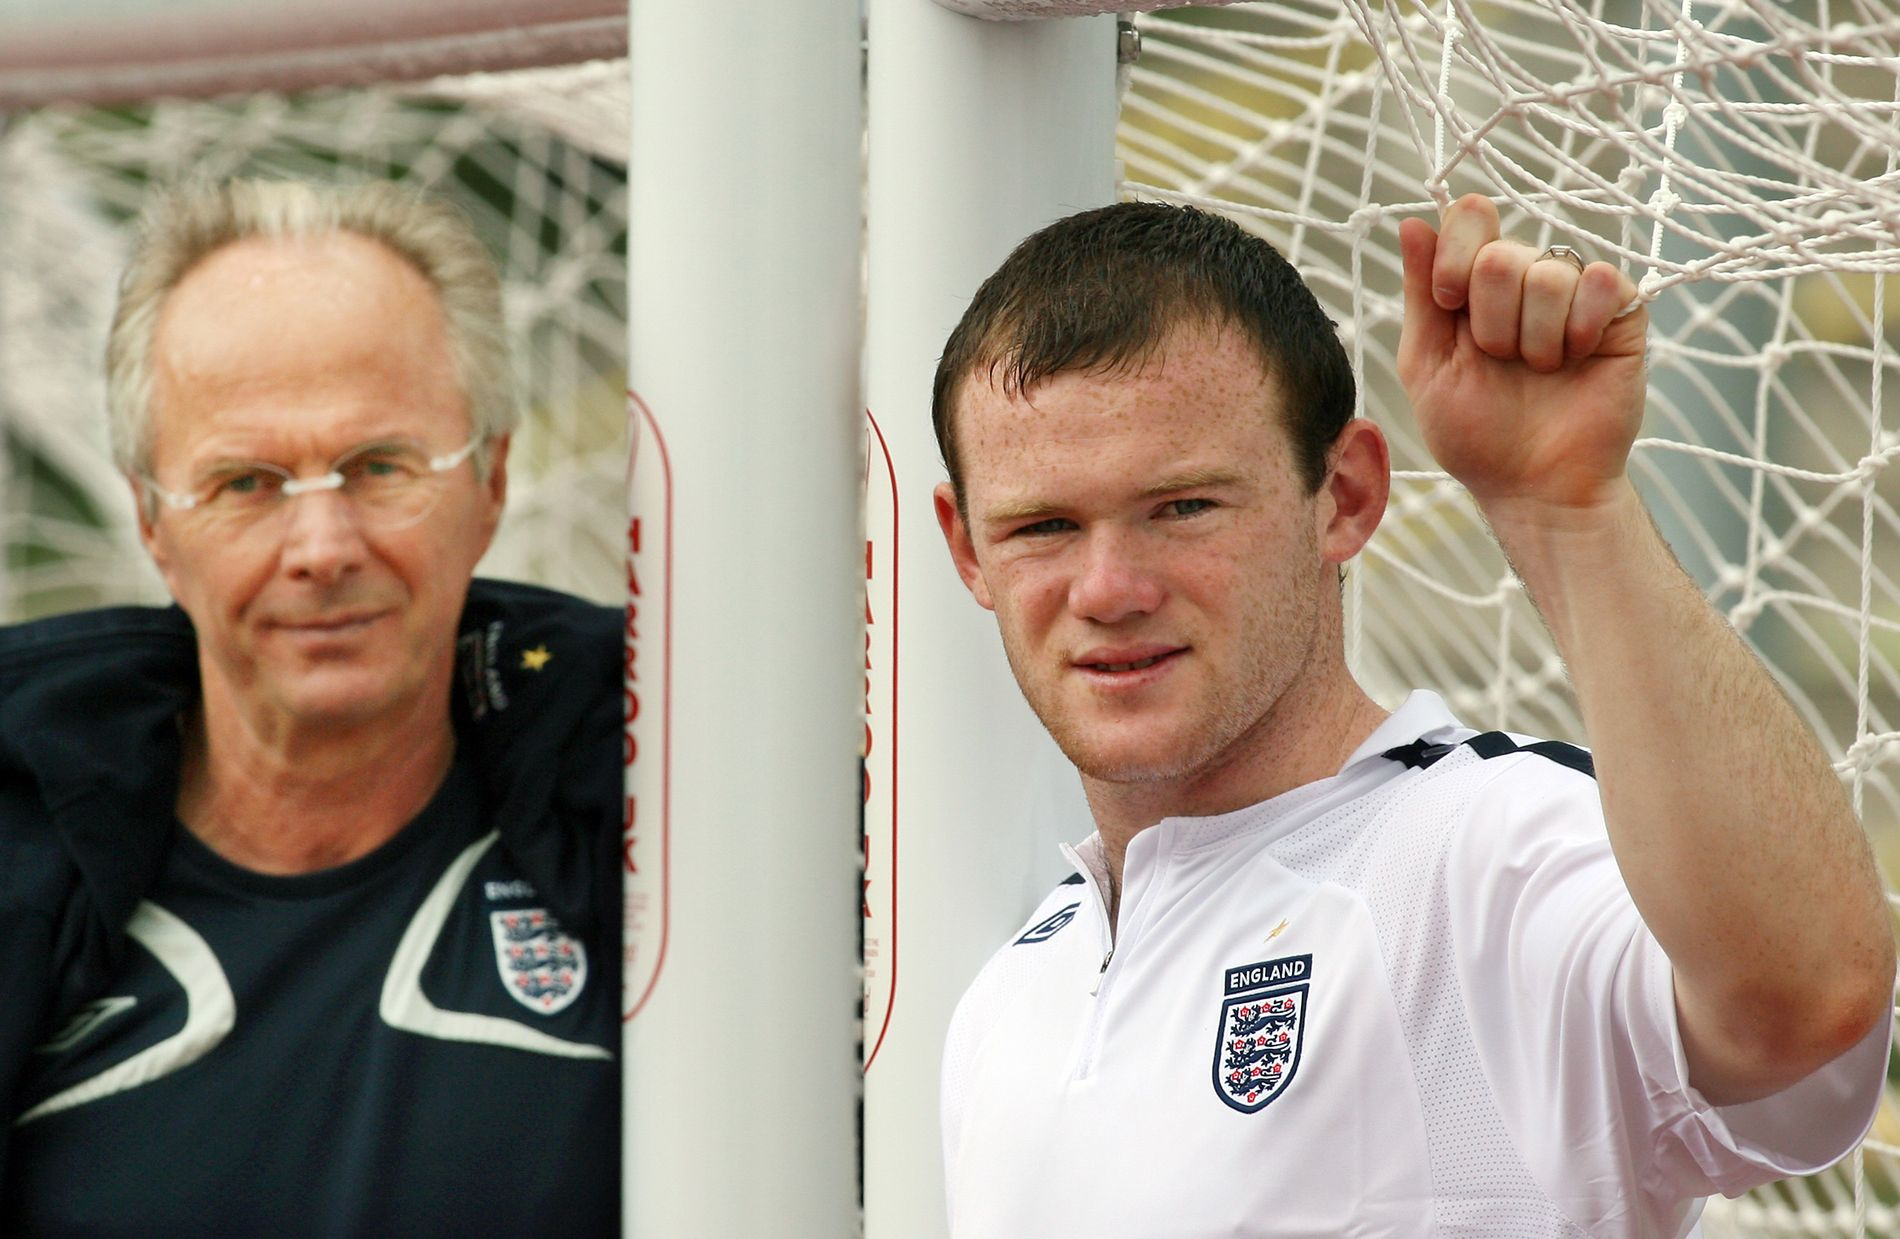 GAMLE VENNER: Englands daværende landslagstrener, svenske Sven-Göran Eriksson, sammen med Wayne Rooney (til høyre) i Tyskland for litt over 10 år siden. Nå vil Eriksson at Uniteds kaptein flytter til Kina.